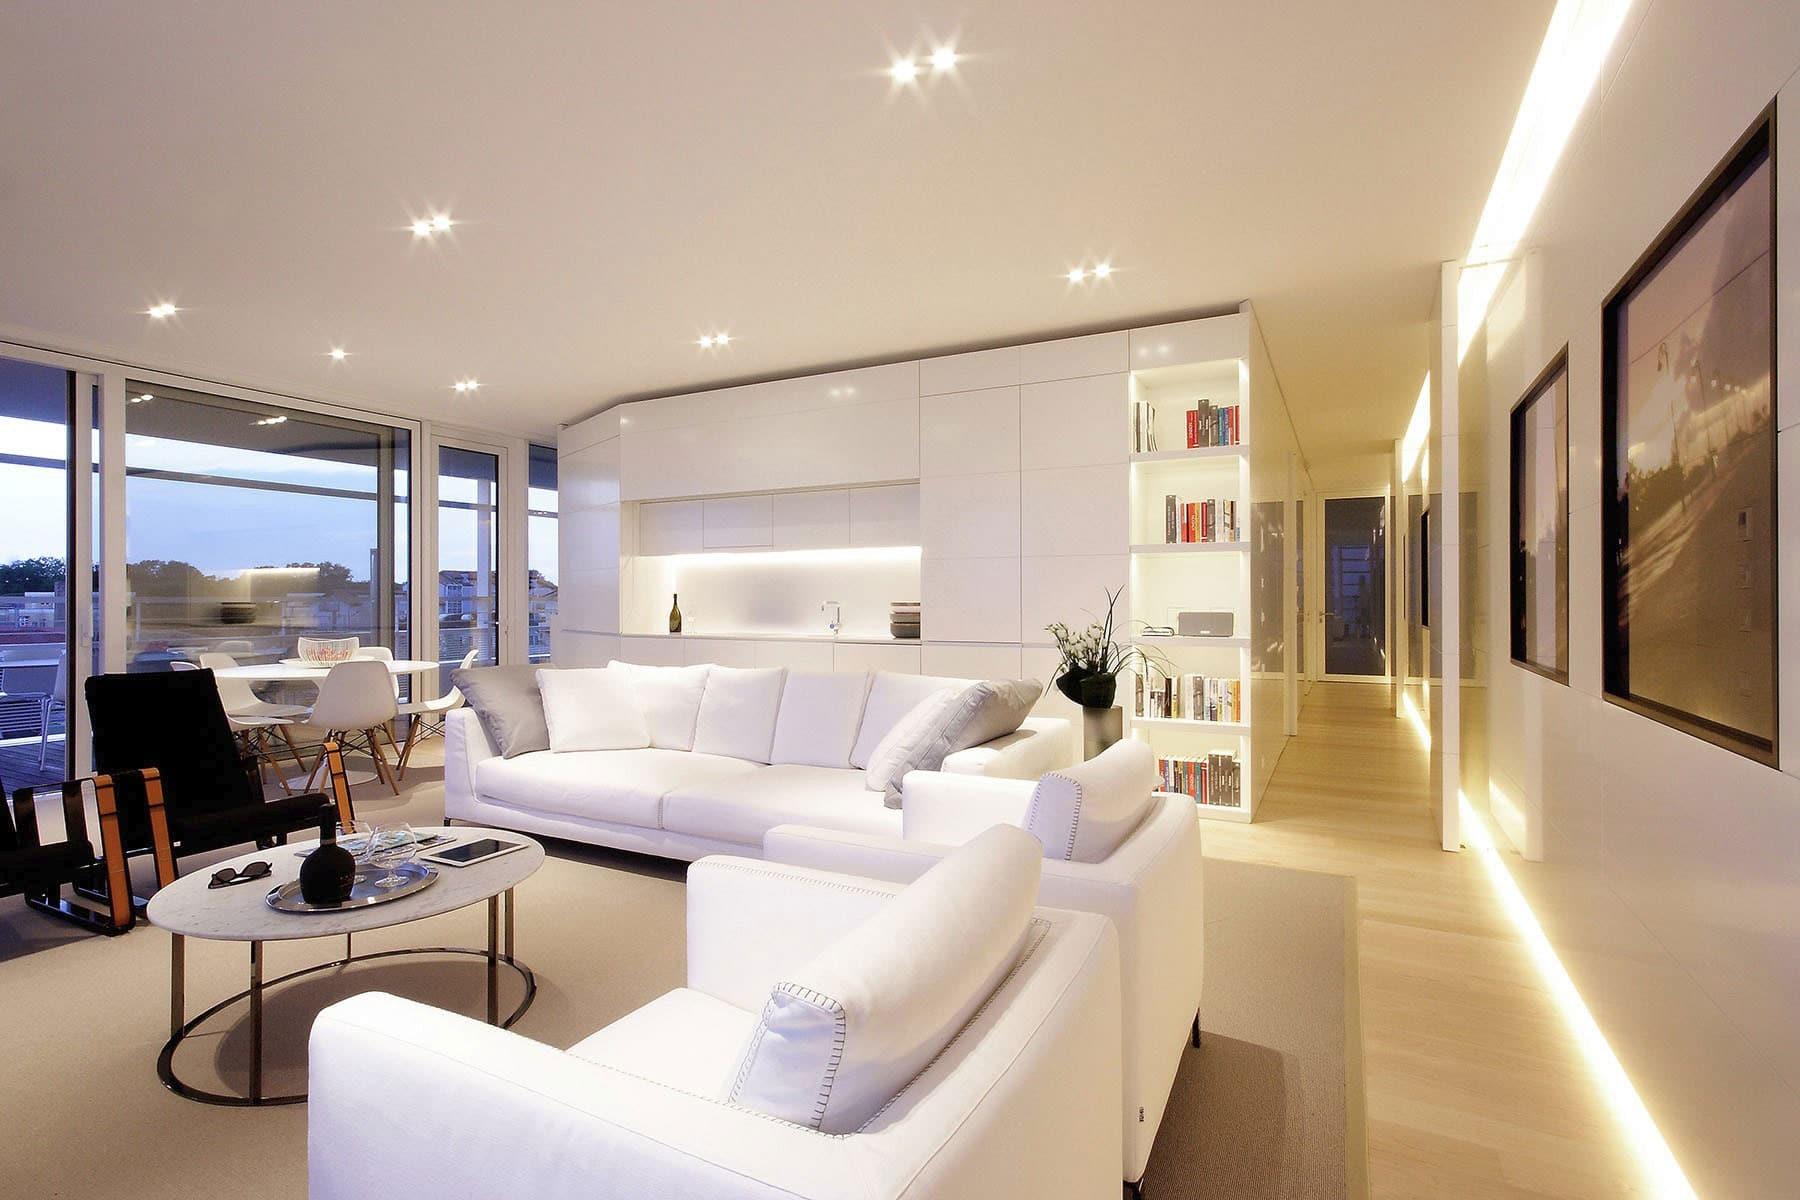 Plano departamento peque o dos dormitorios for Interiores de departamentos pequenos